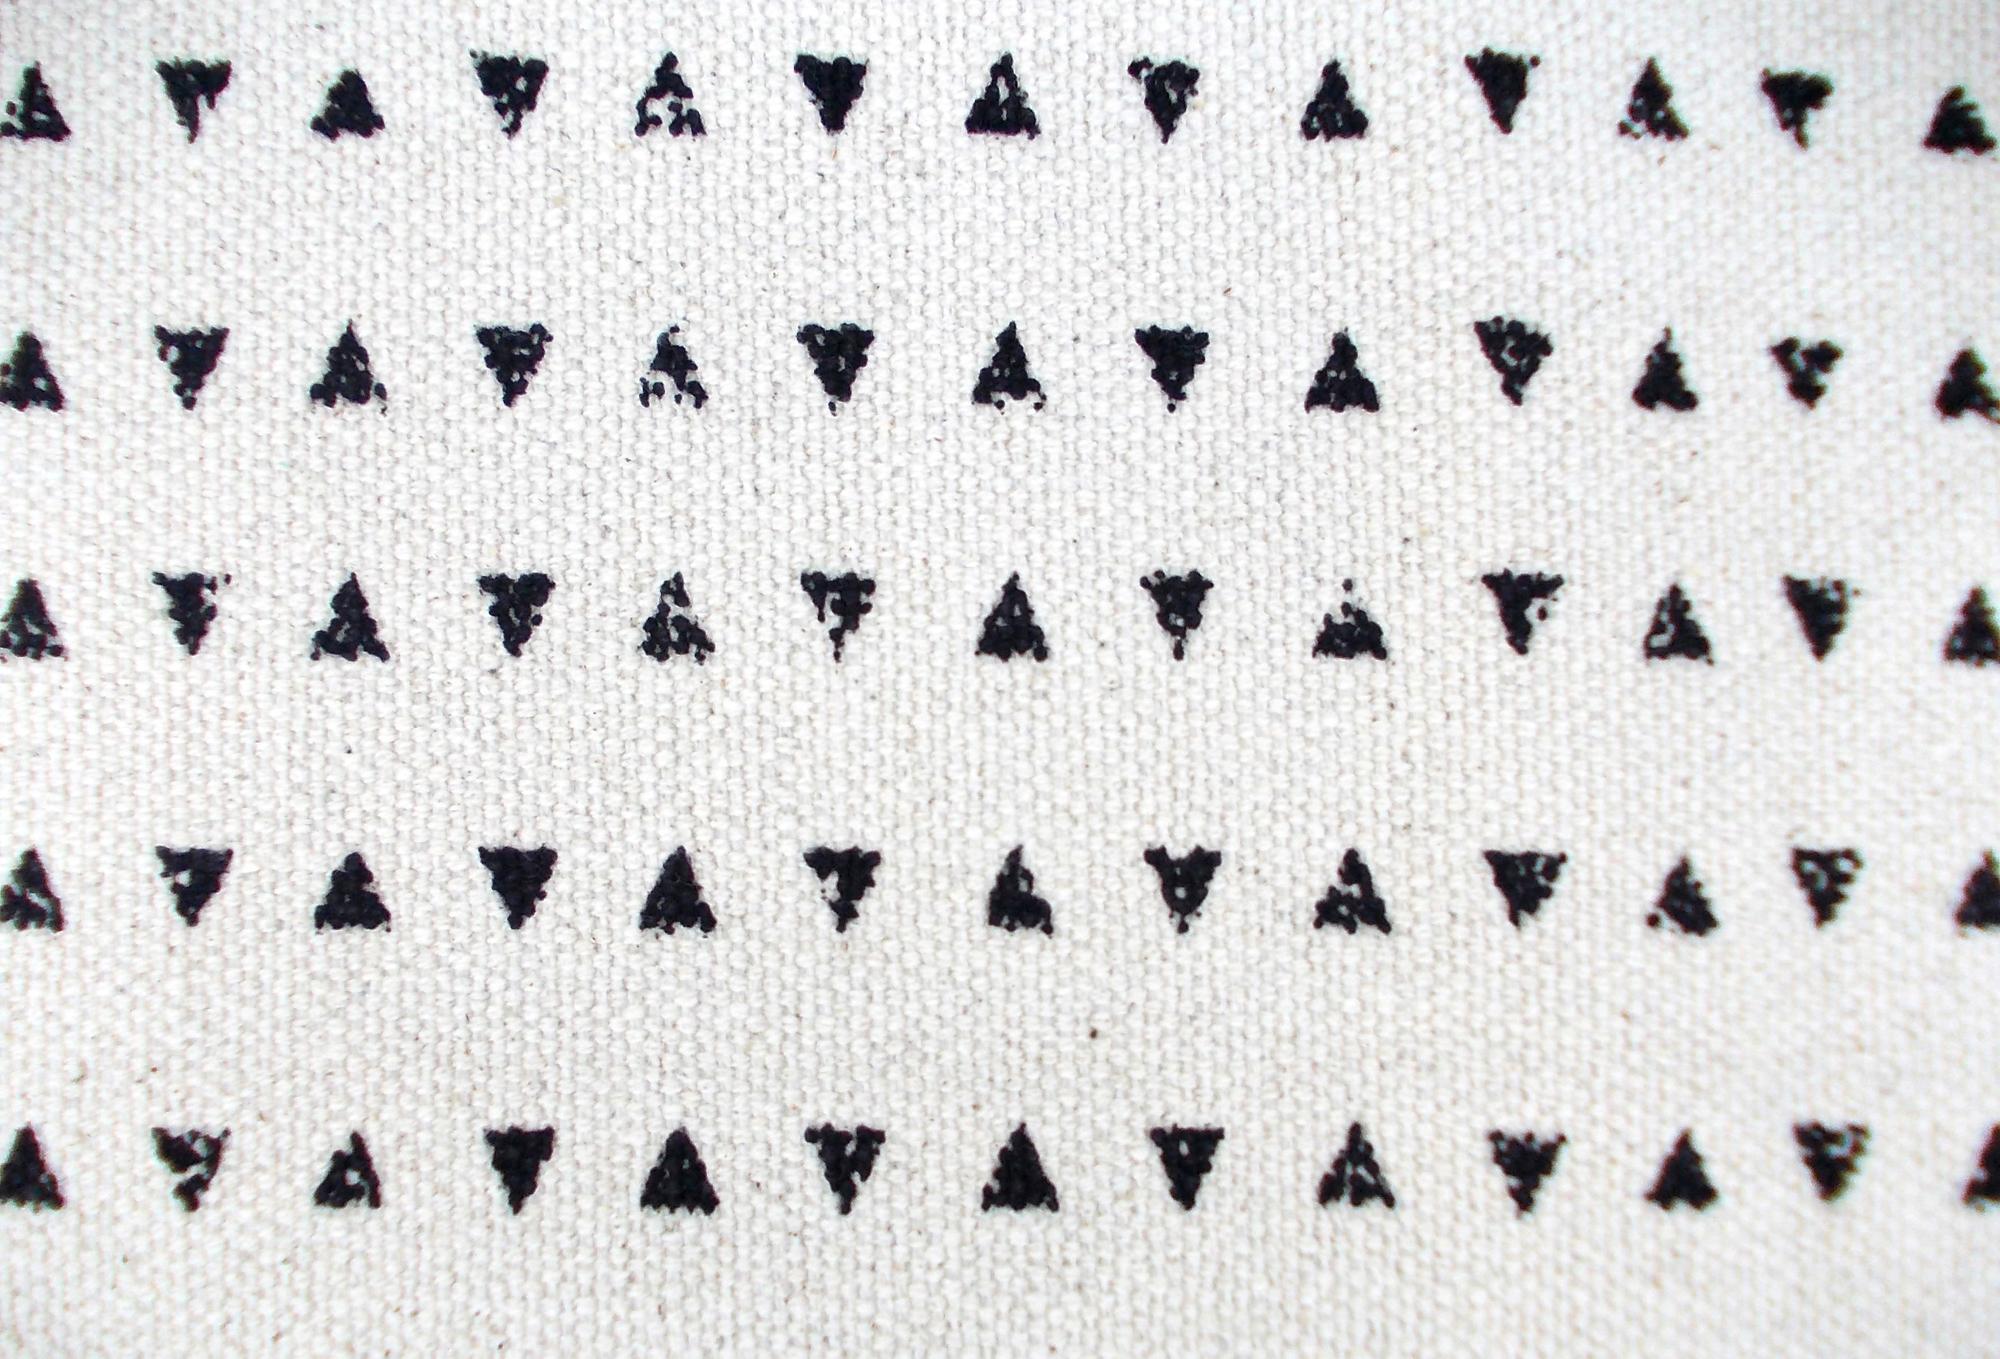 Aztec cotton rug, black and white, geometrical, navajo print, bohemian, tribal, 100% cotton, size 24X36 inches